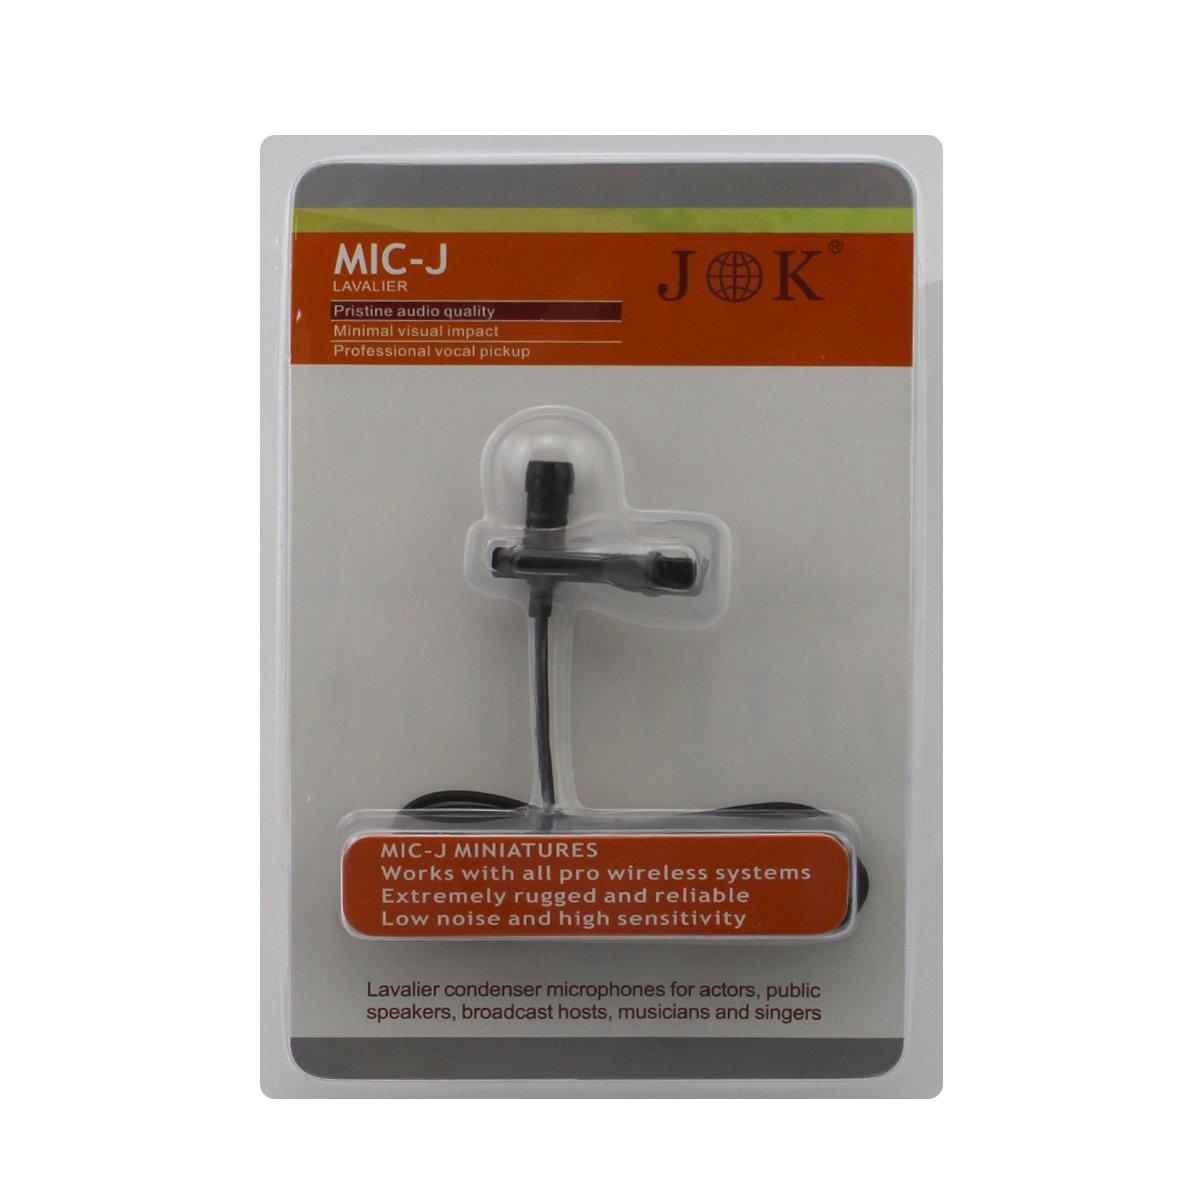 Pro Lavalier Lapel Microphone JK MIC-J 016 Unidirectional Condenser Microphone for Shure Wireless Transmitter JK ELECTRONICS JK-MIC-016-TA4F